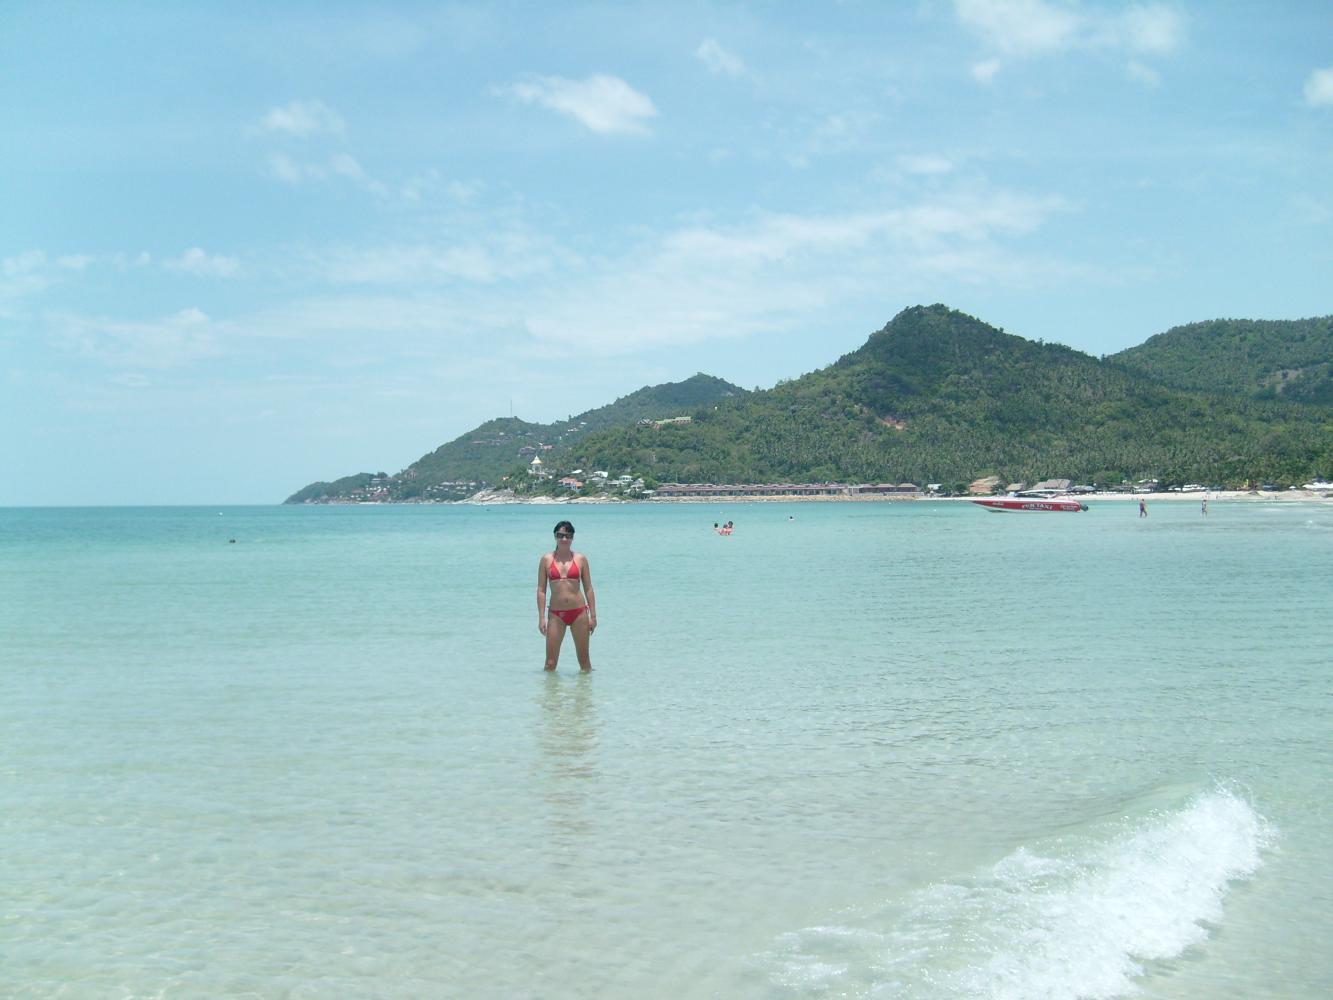 тут тайланд остров самуи отзывы с фото значит